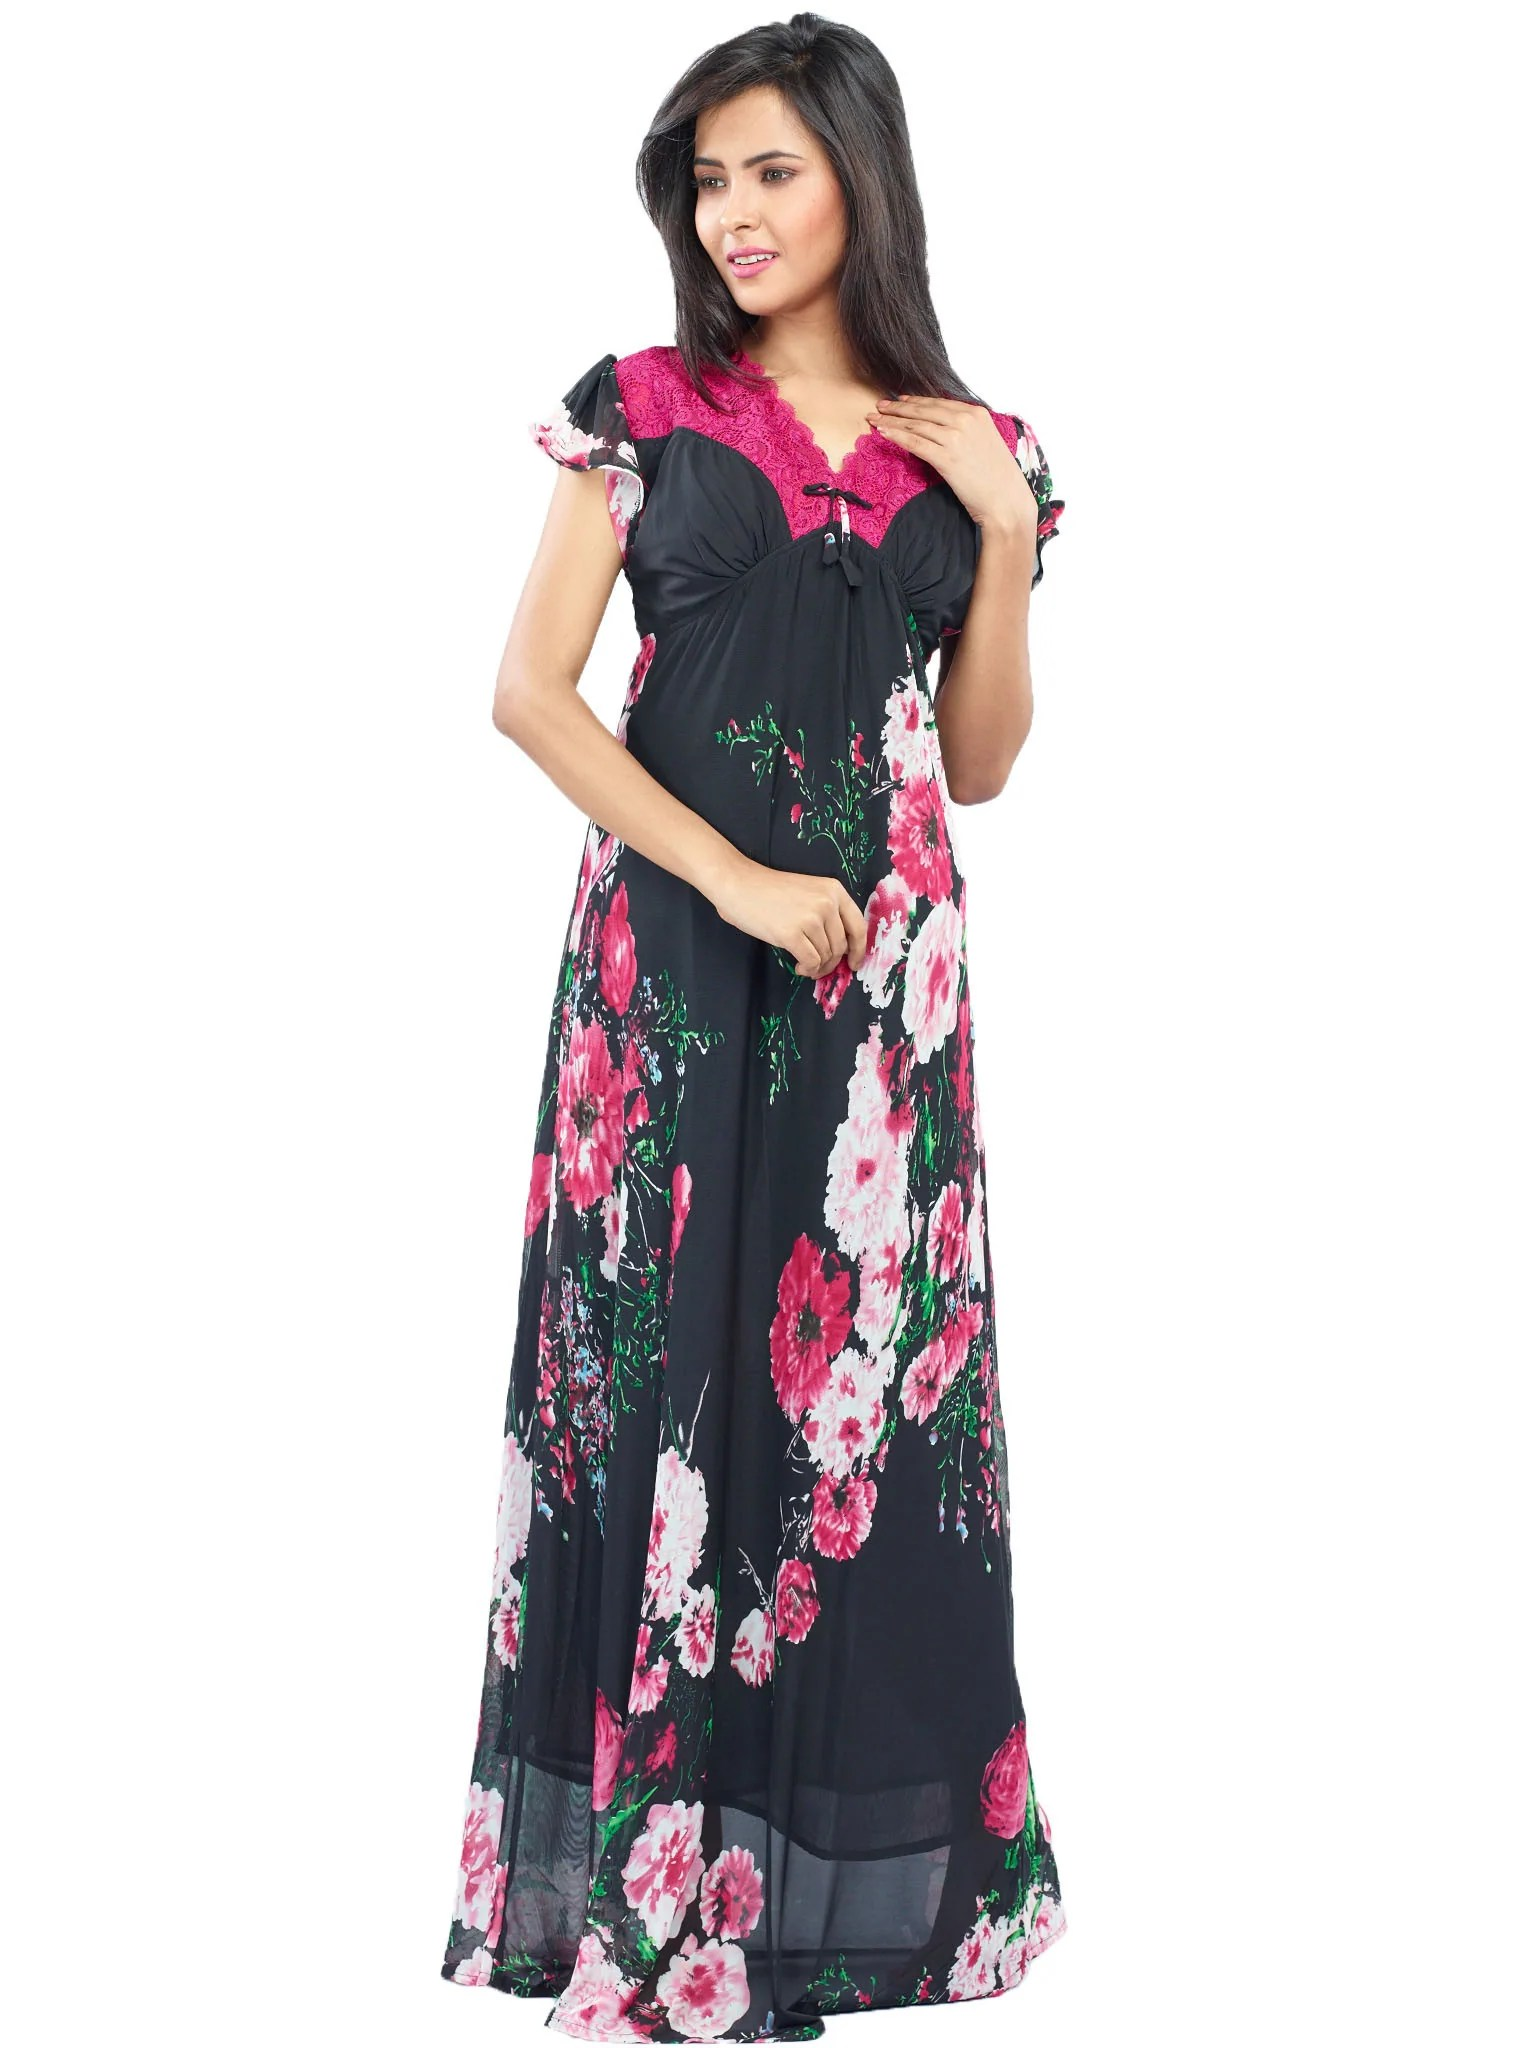 c2b58a382 Night Wear Lingerie Shopping Online Buy Bra Online Panties